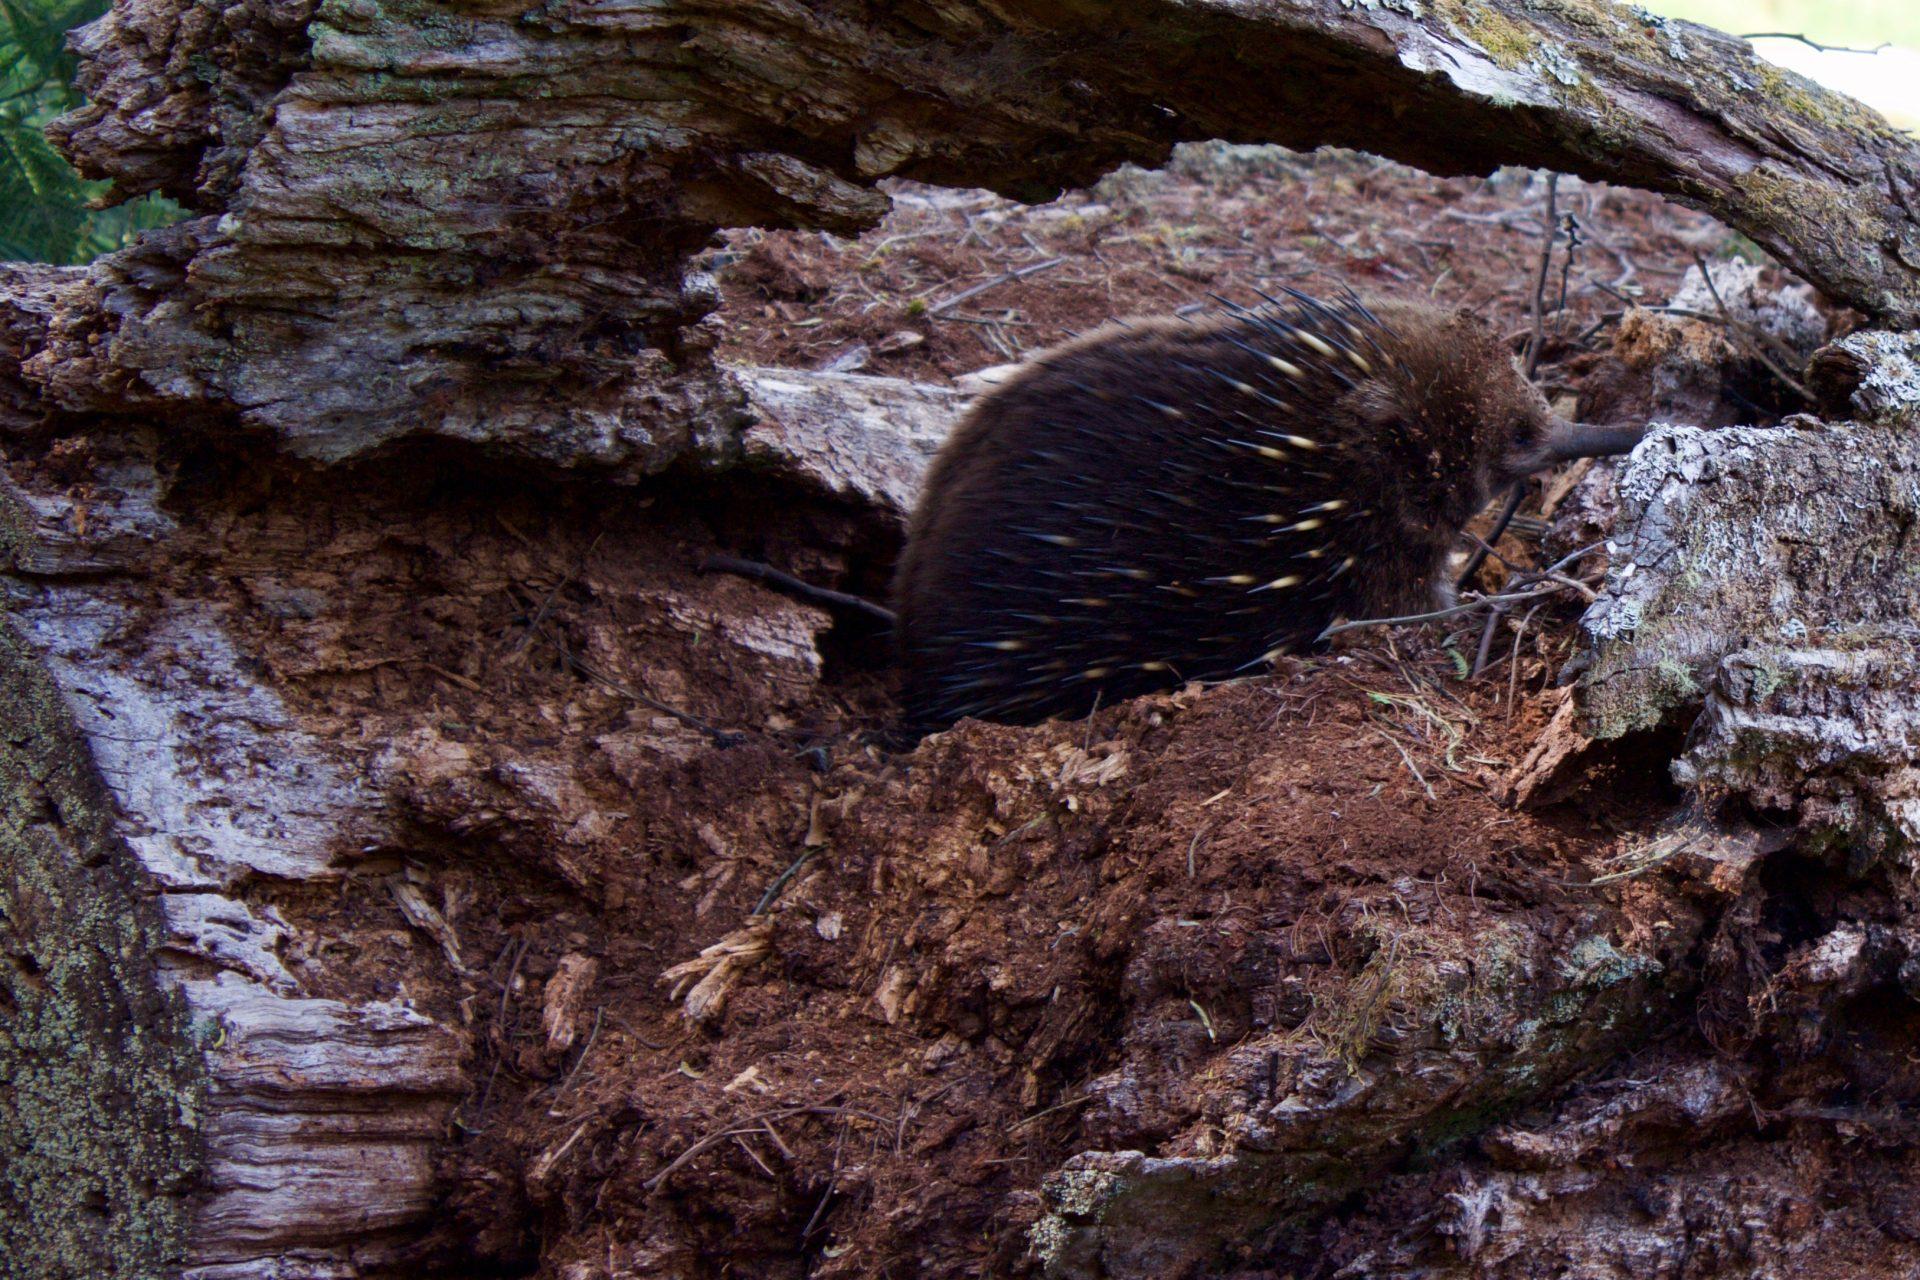 Echidna –Tasmania, AU